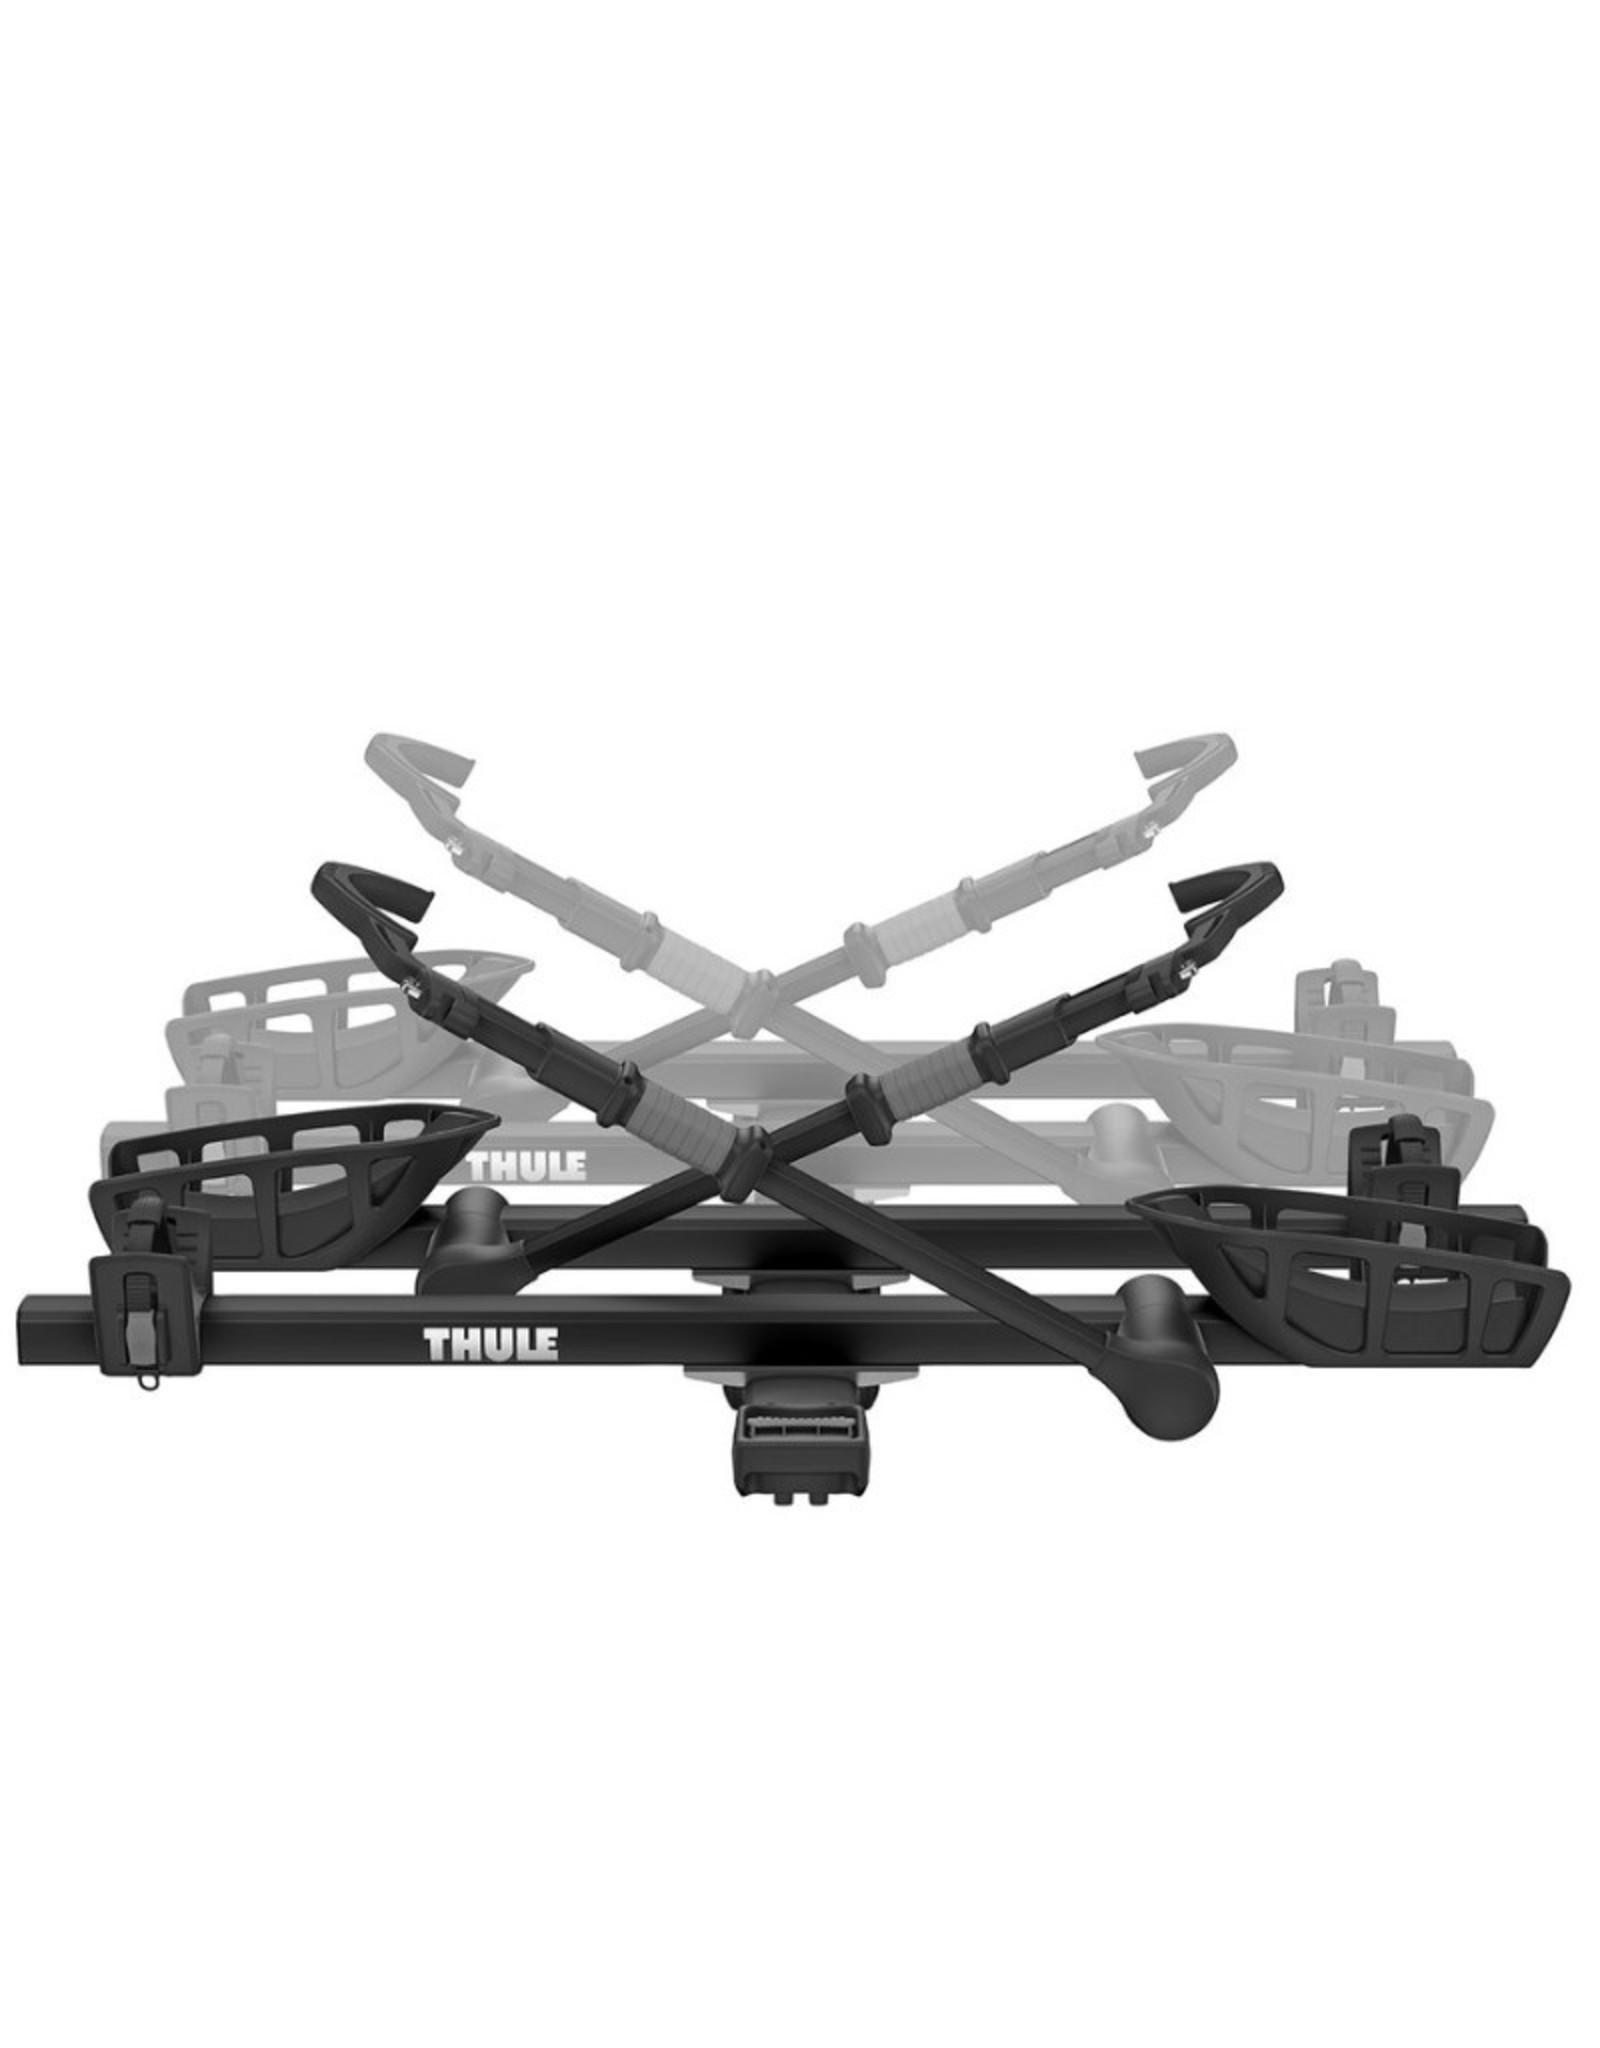 "Thule THULE T2 PRO XT BLACK 2 ""hitch mounted bike rack add-on for 2 BIKES"